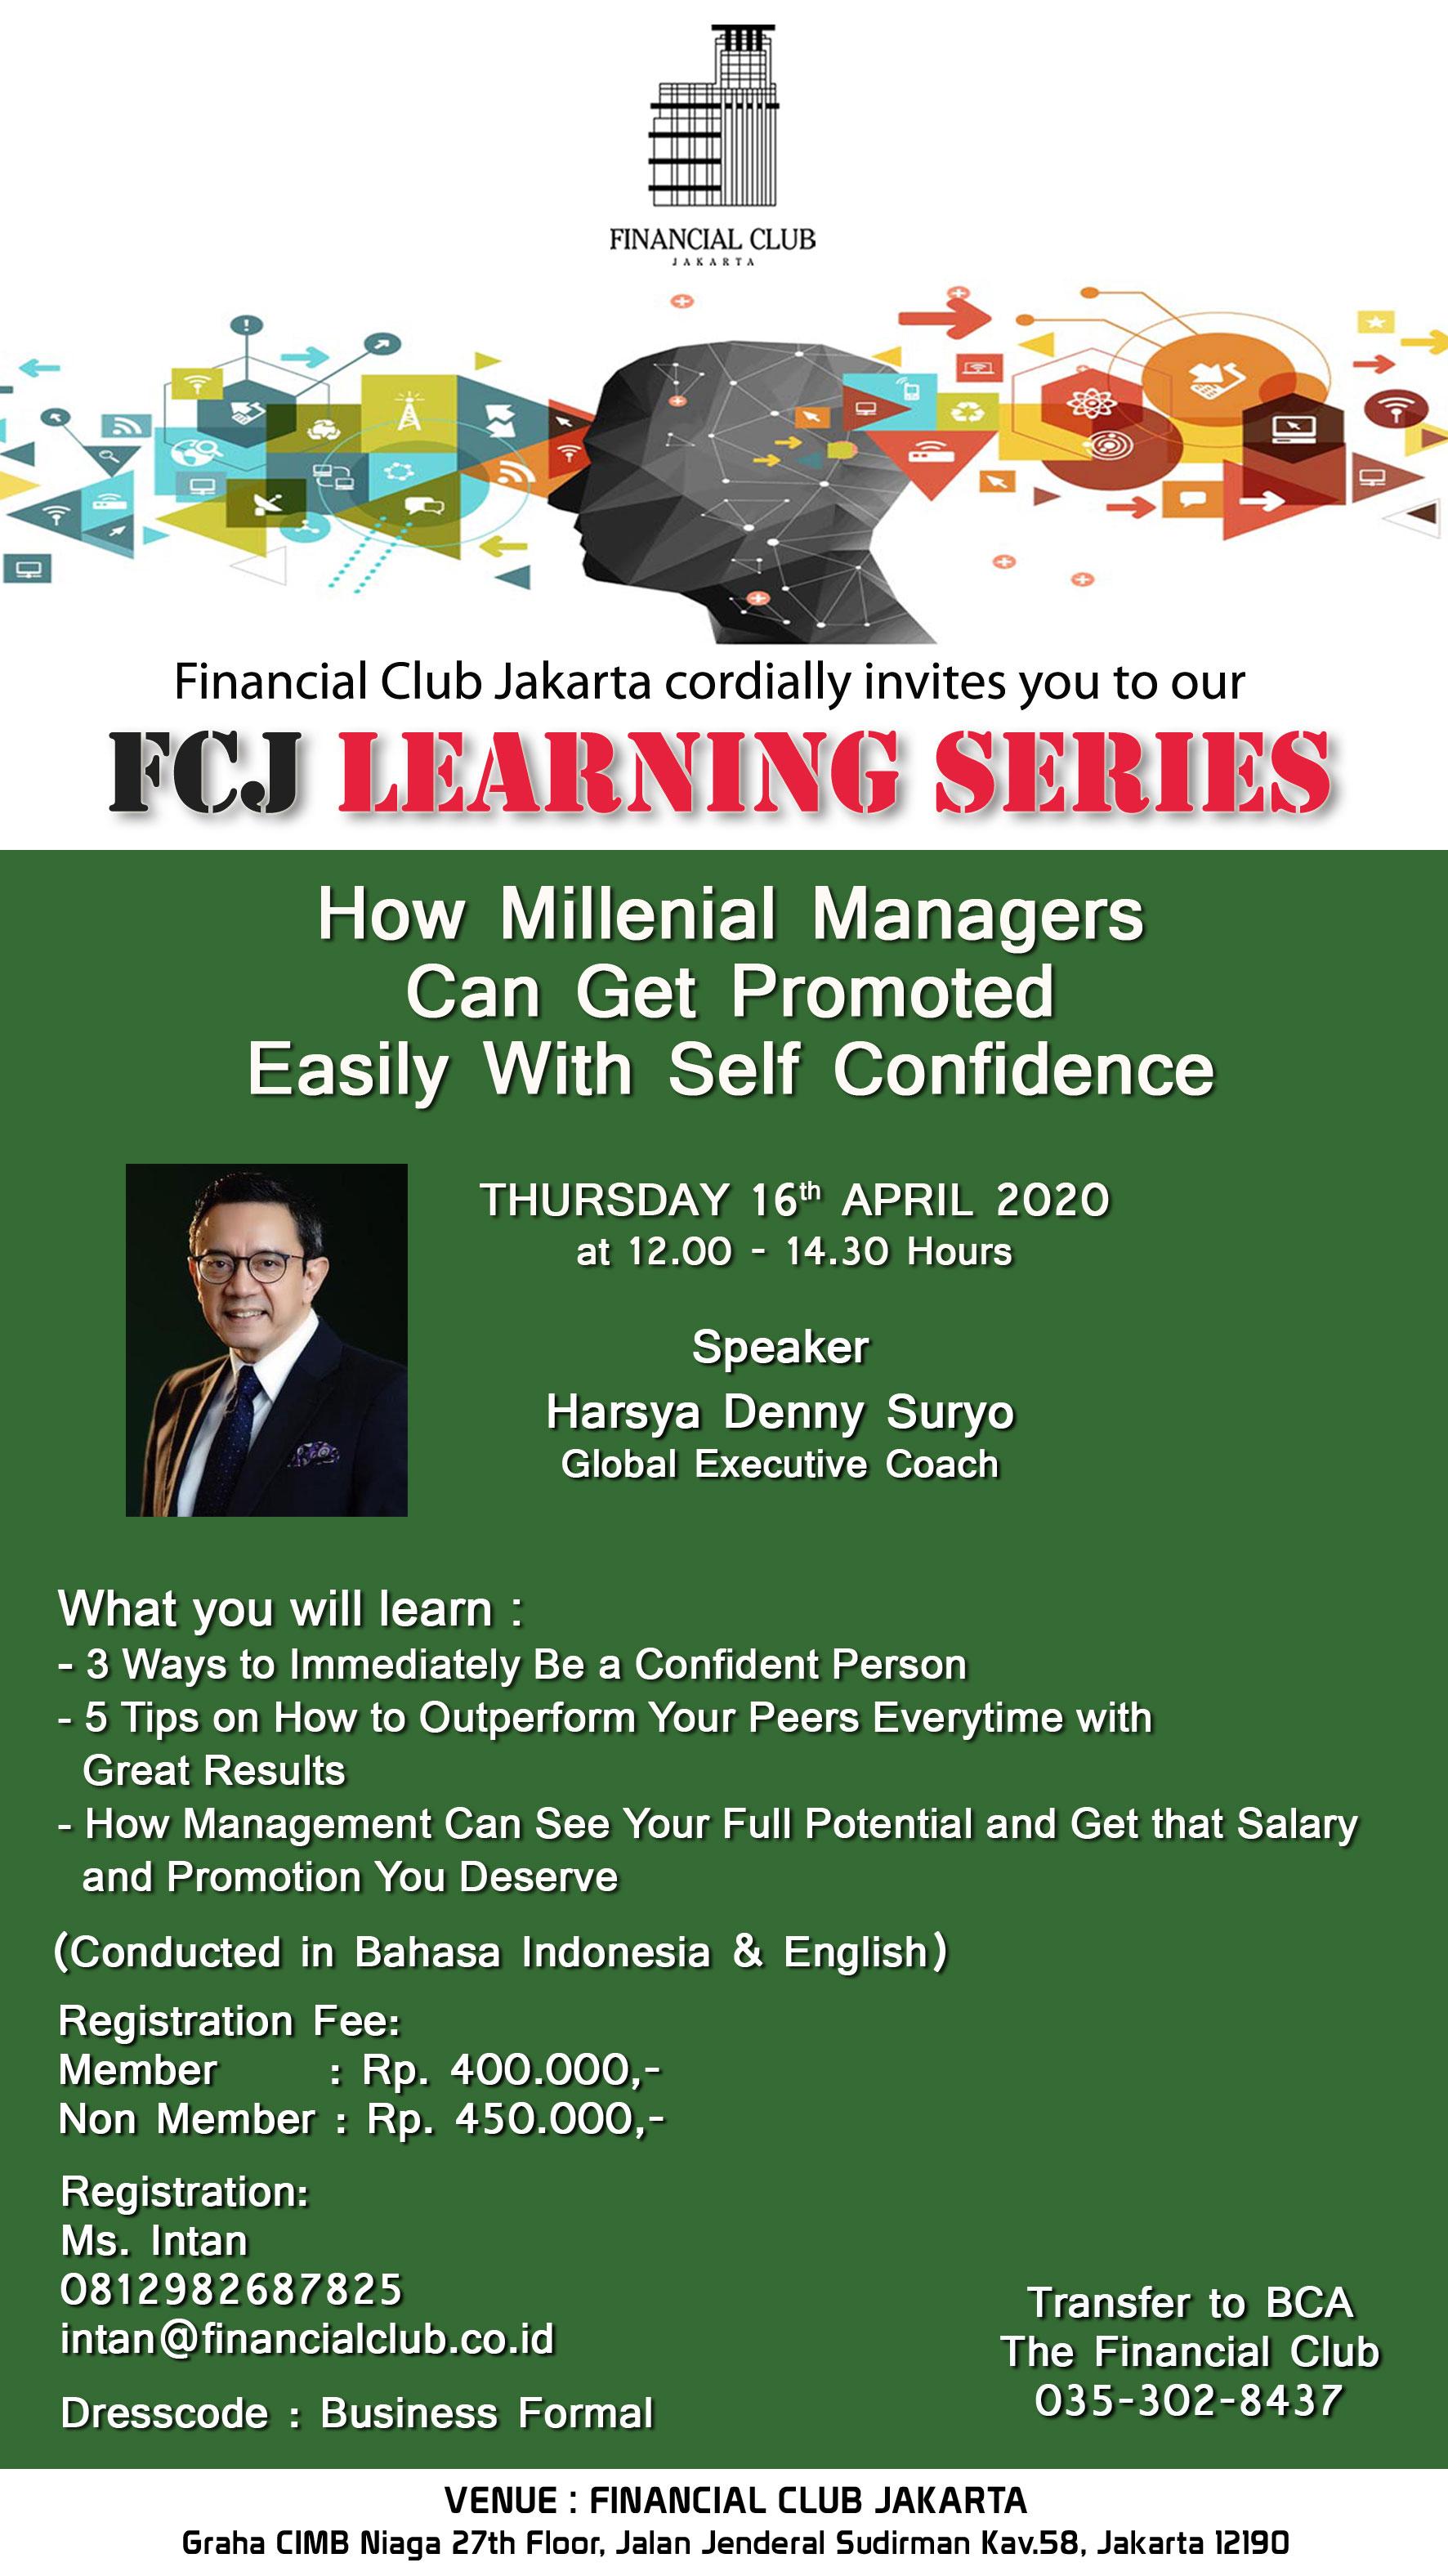 FCJ Learning Series, Thursday, 16th April 2020